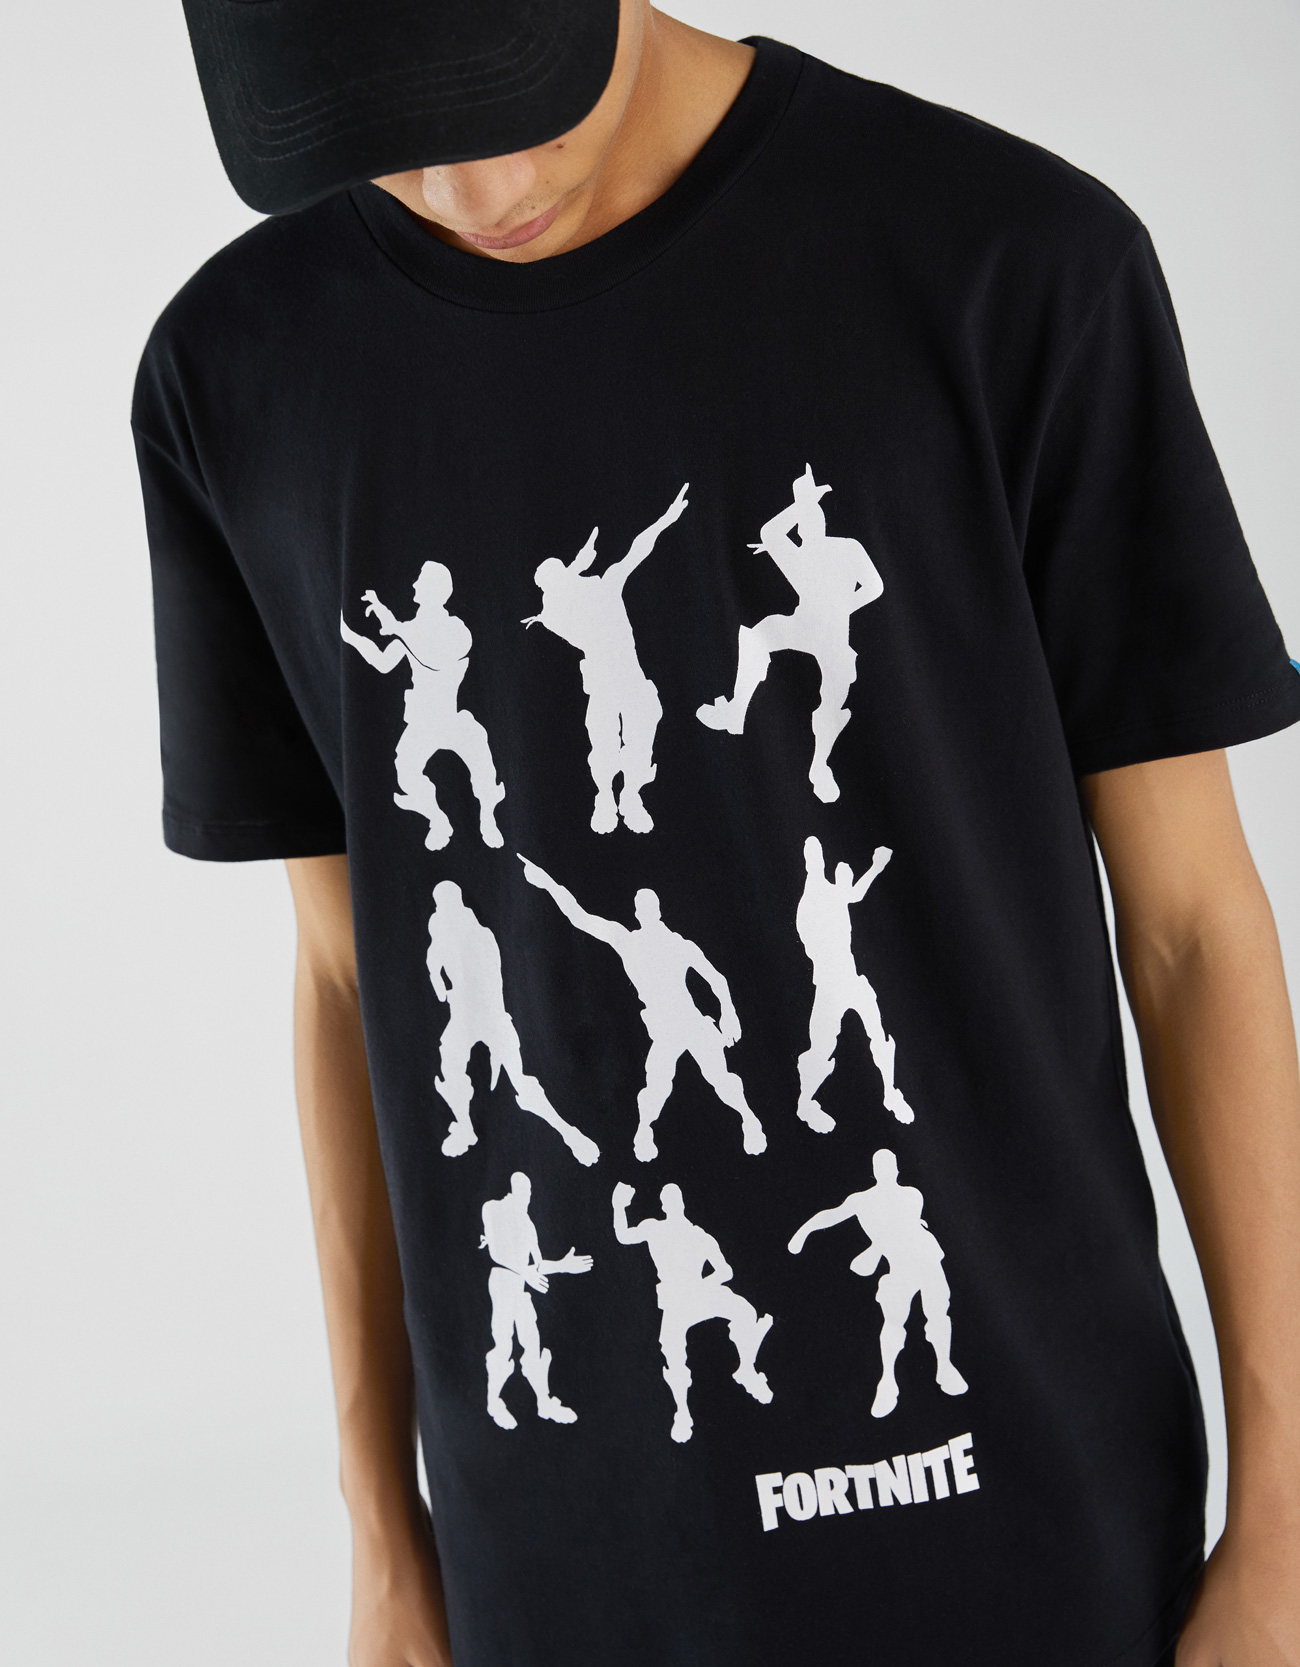 Shirt Fortnite T Shirts Bershka Germany